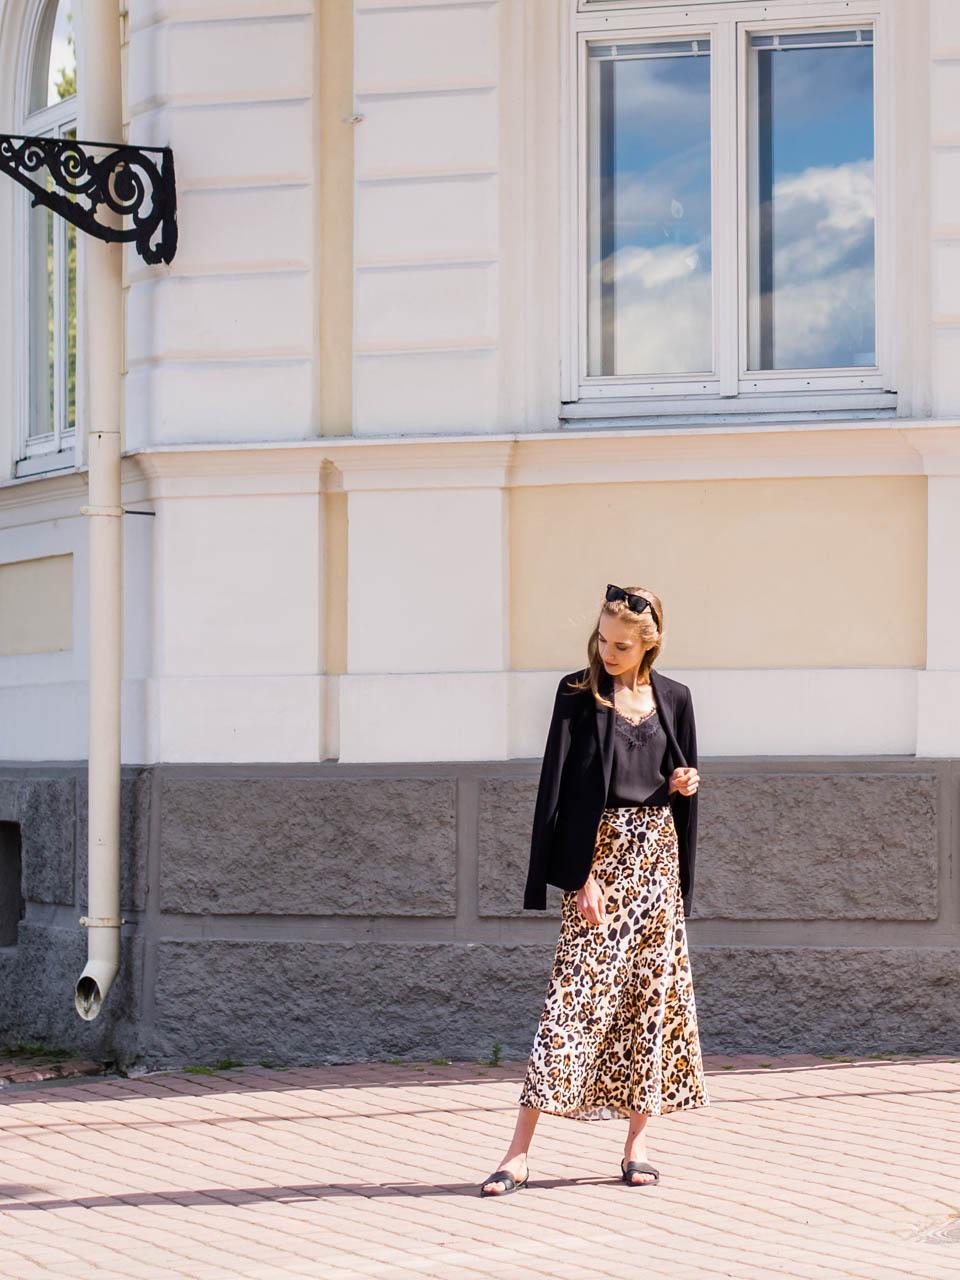 8 leopard print outfits - 8 asua leopardikuosin kanssa